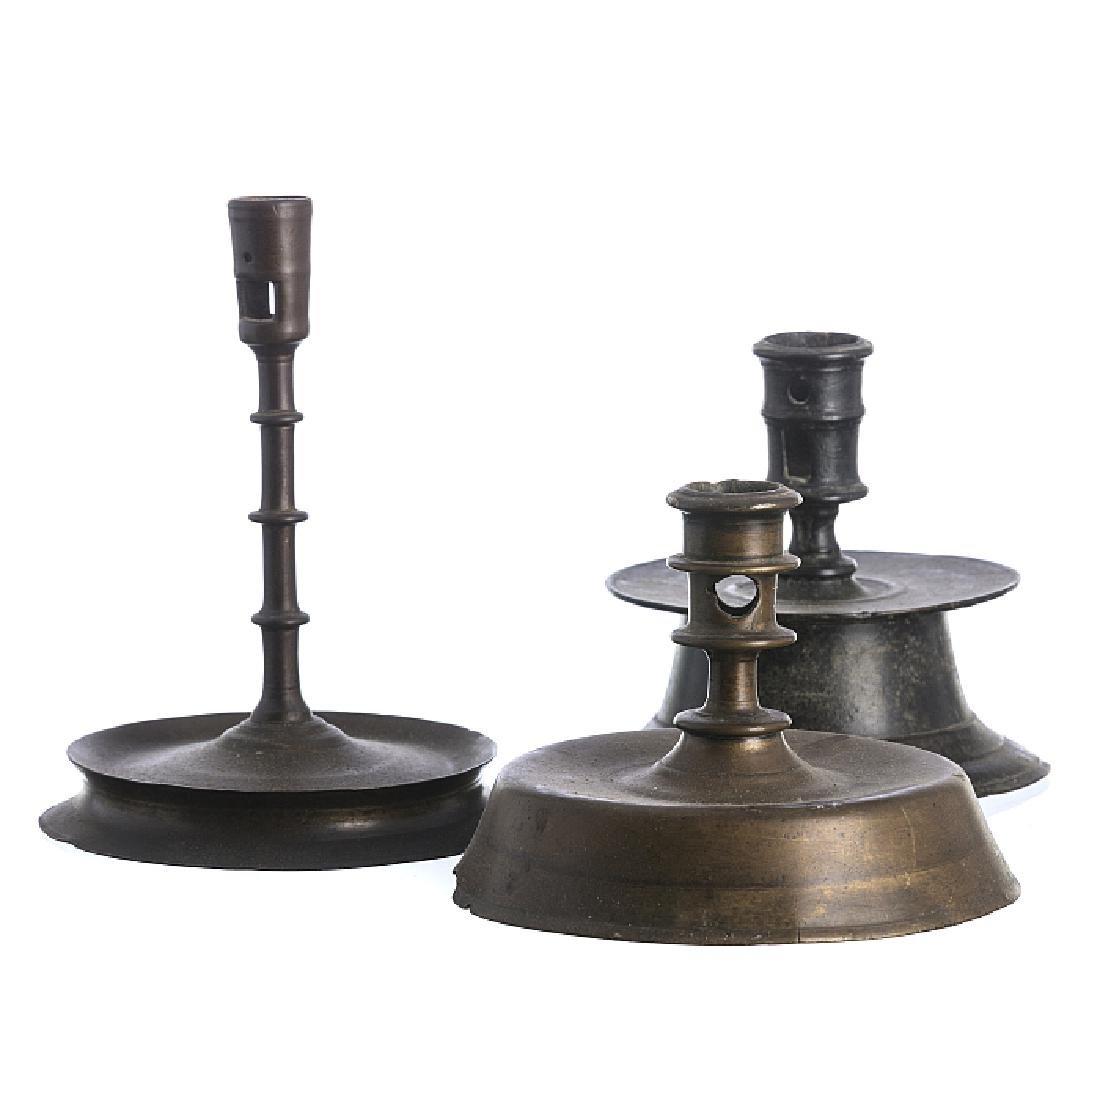 Three trumpet-shaped candlesticks